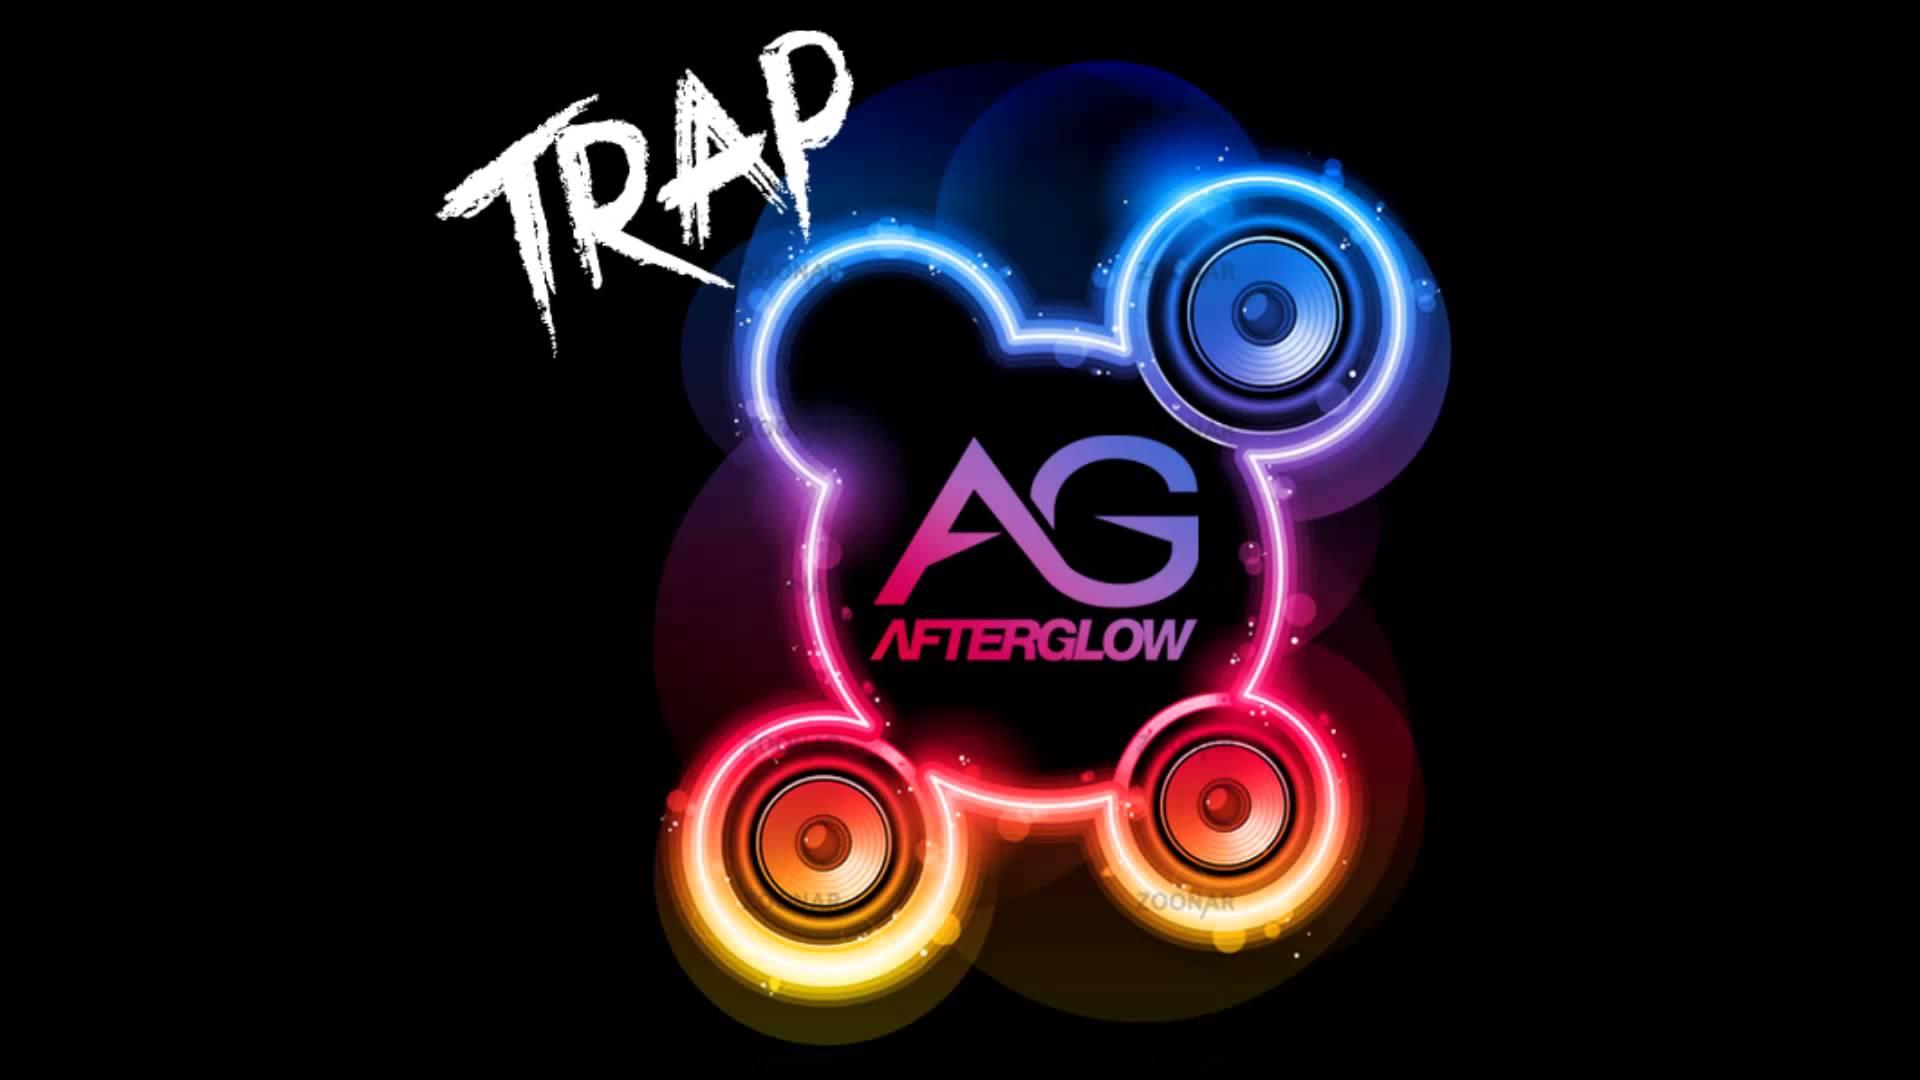 Trap Music Wallpaper - Trap Music , HD Wallpaper & Backgrounds